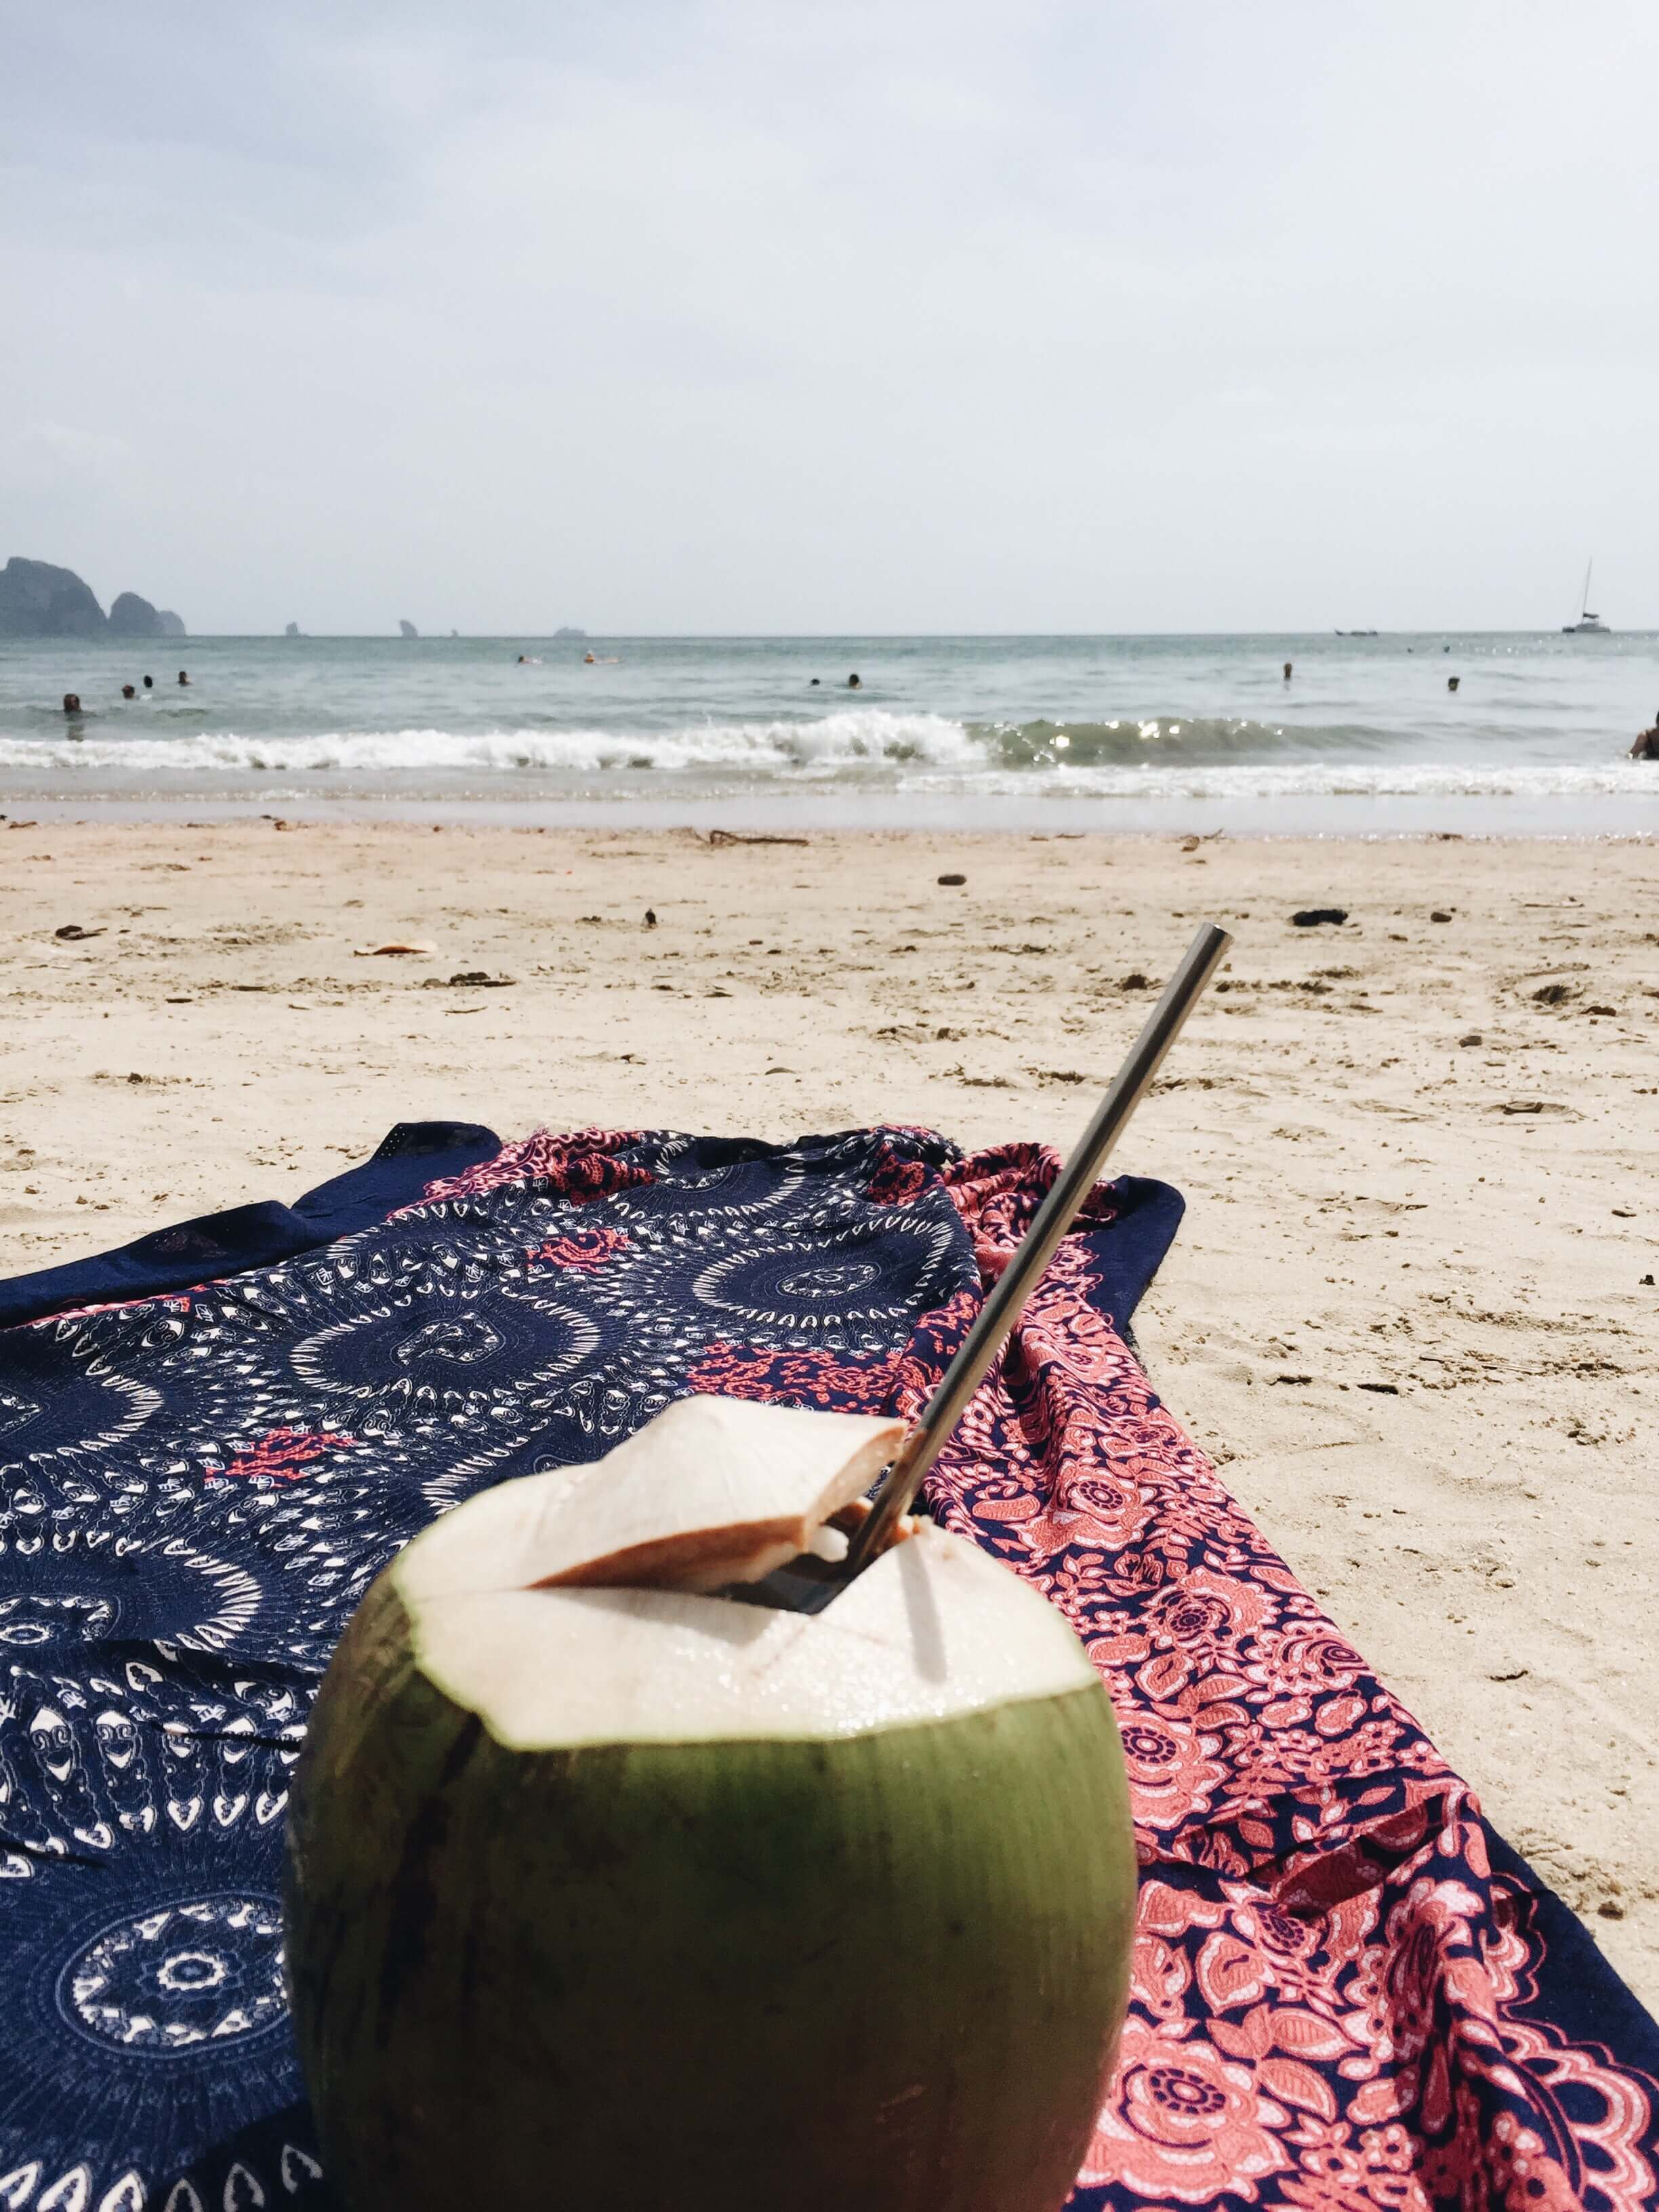 long drink in a coconut